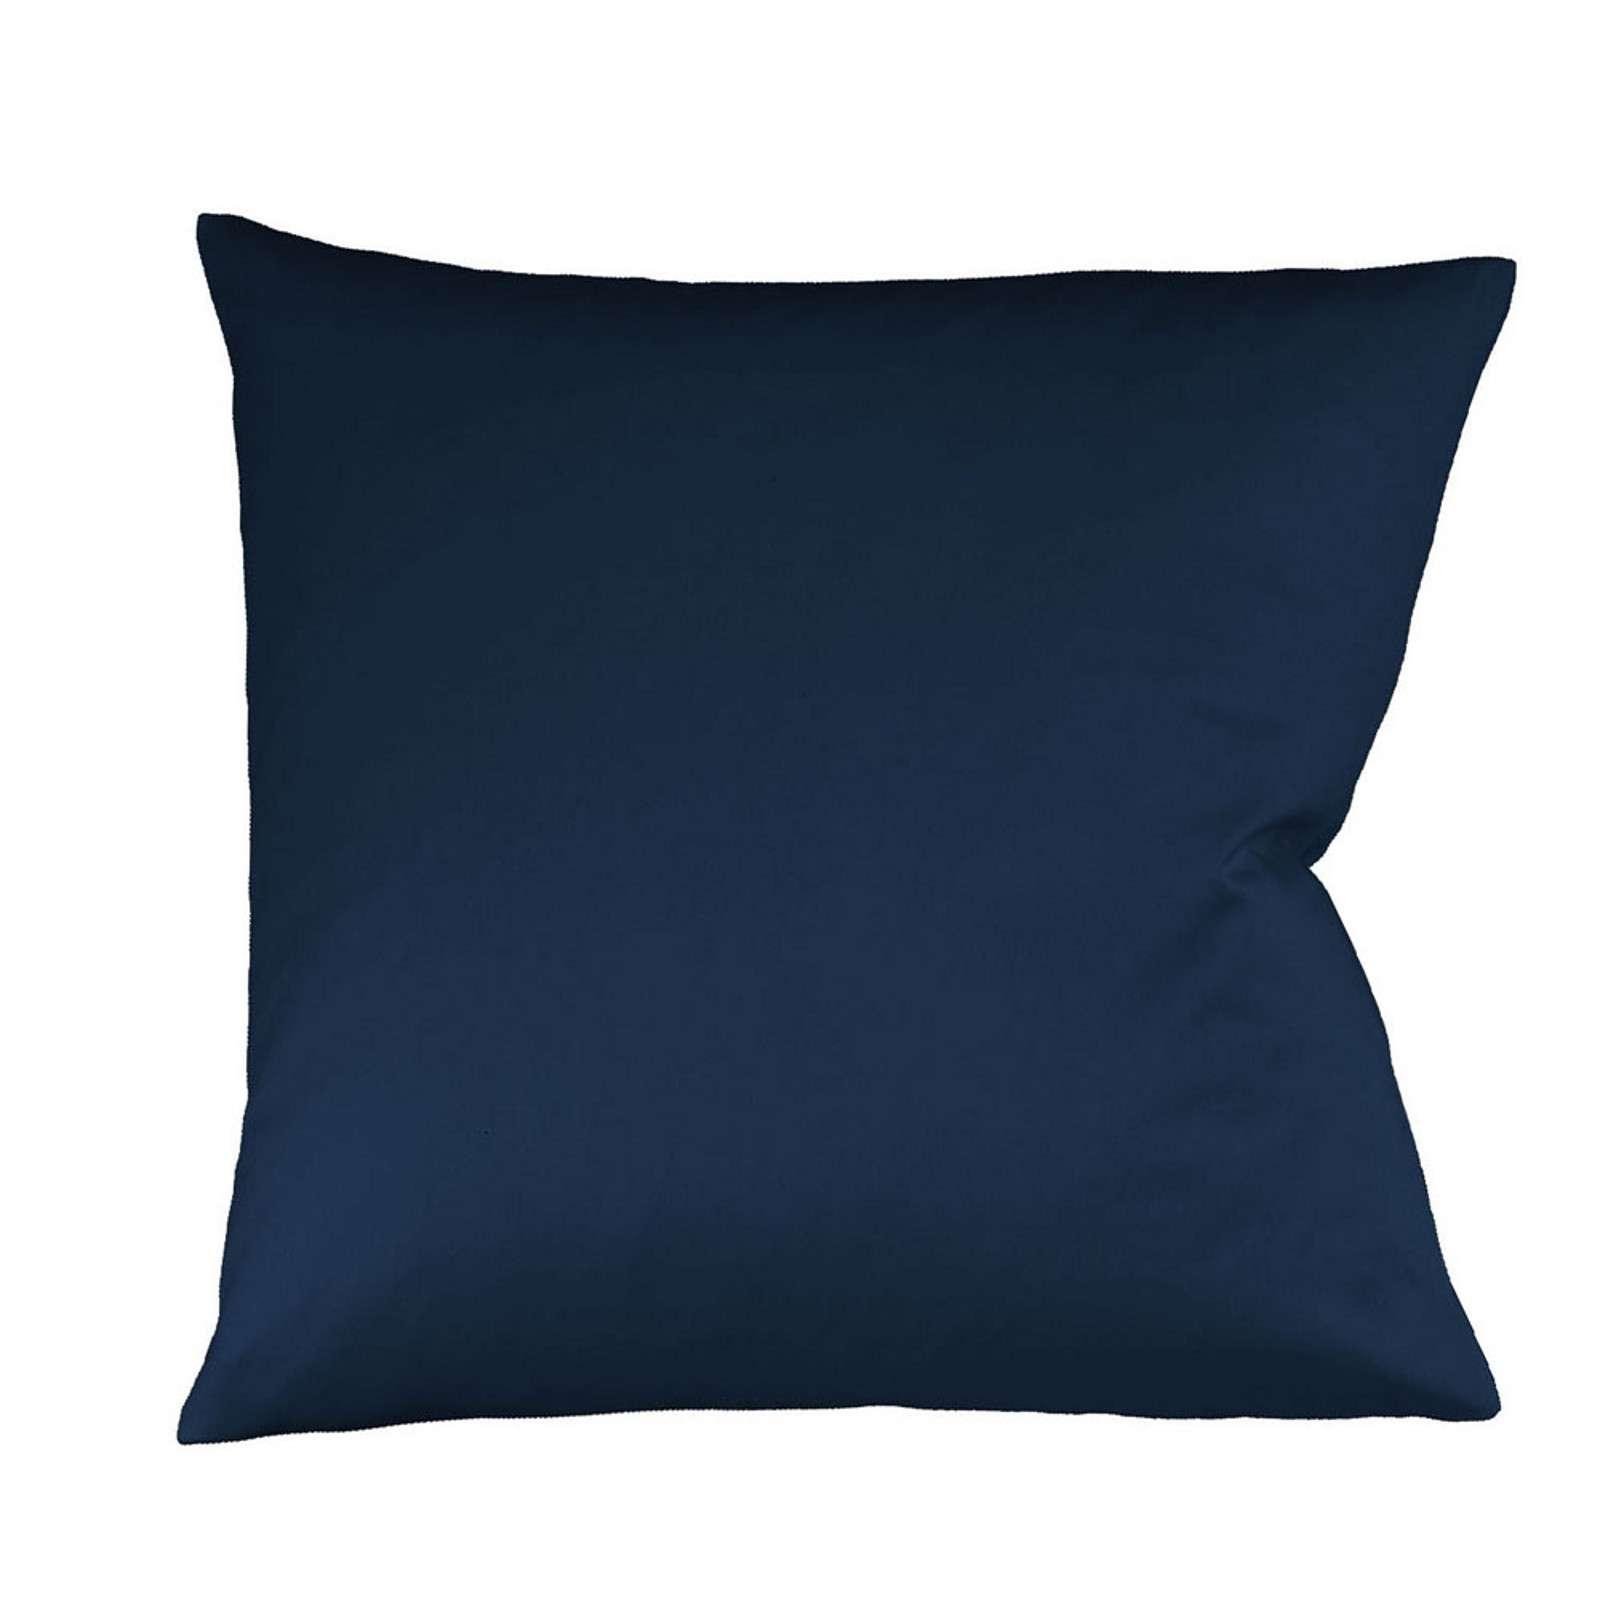 Fleuresse Mako Satin Kissenbezug Uni Colours Nachtblau 6544 Größe